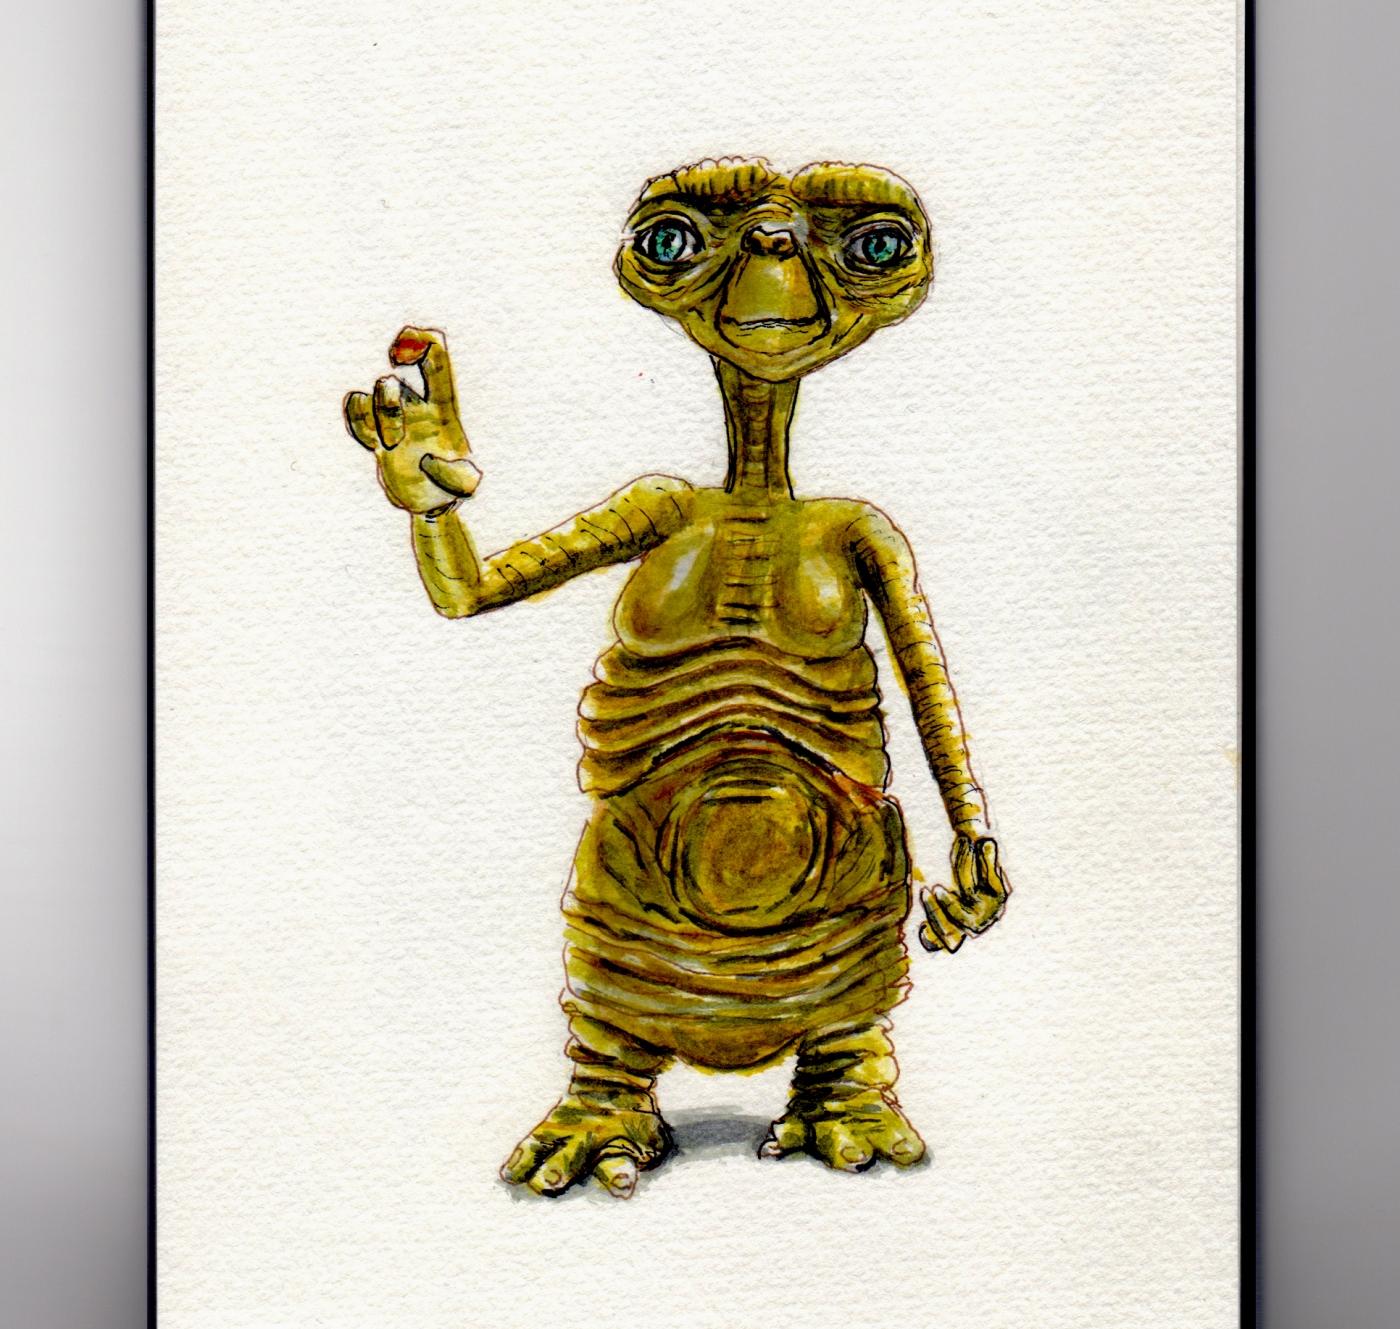 E.T. the Extra-Terrestrial Doodlewash